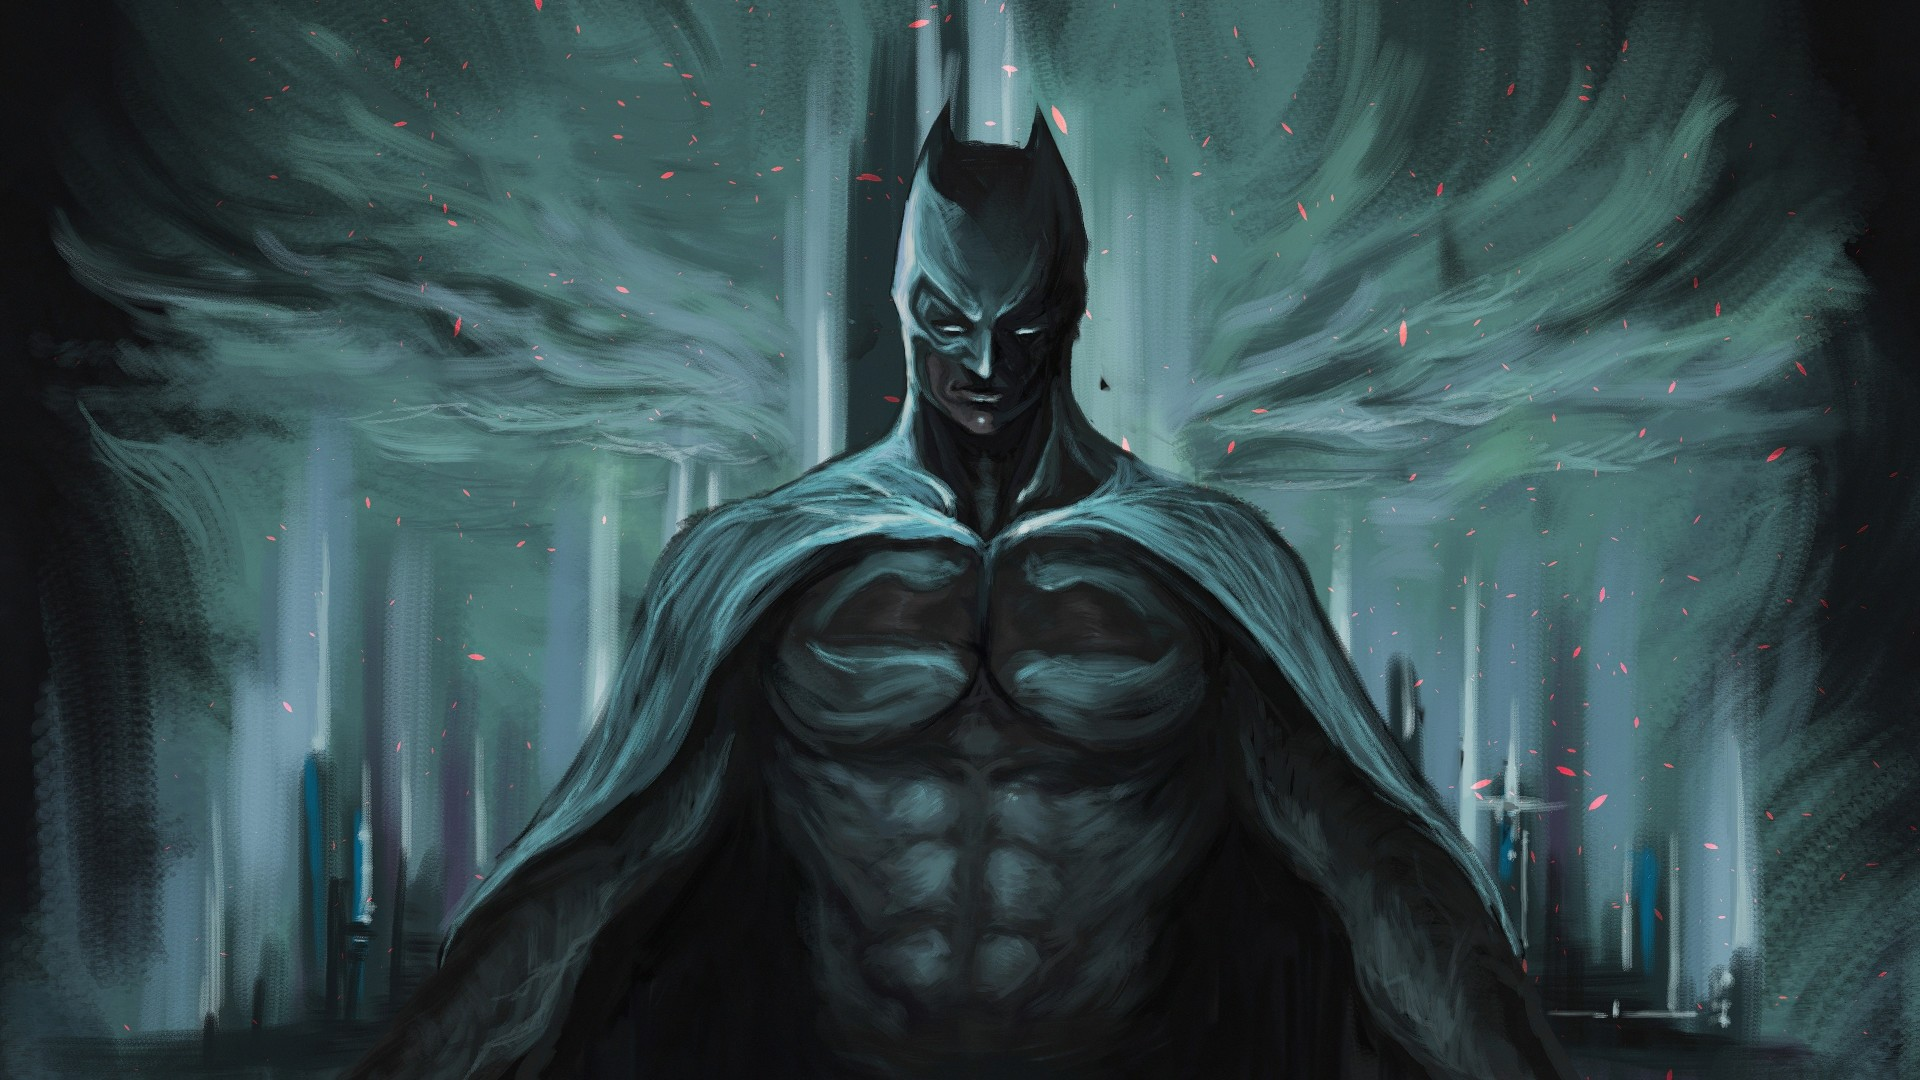 Batman Art Background